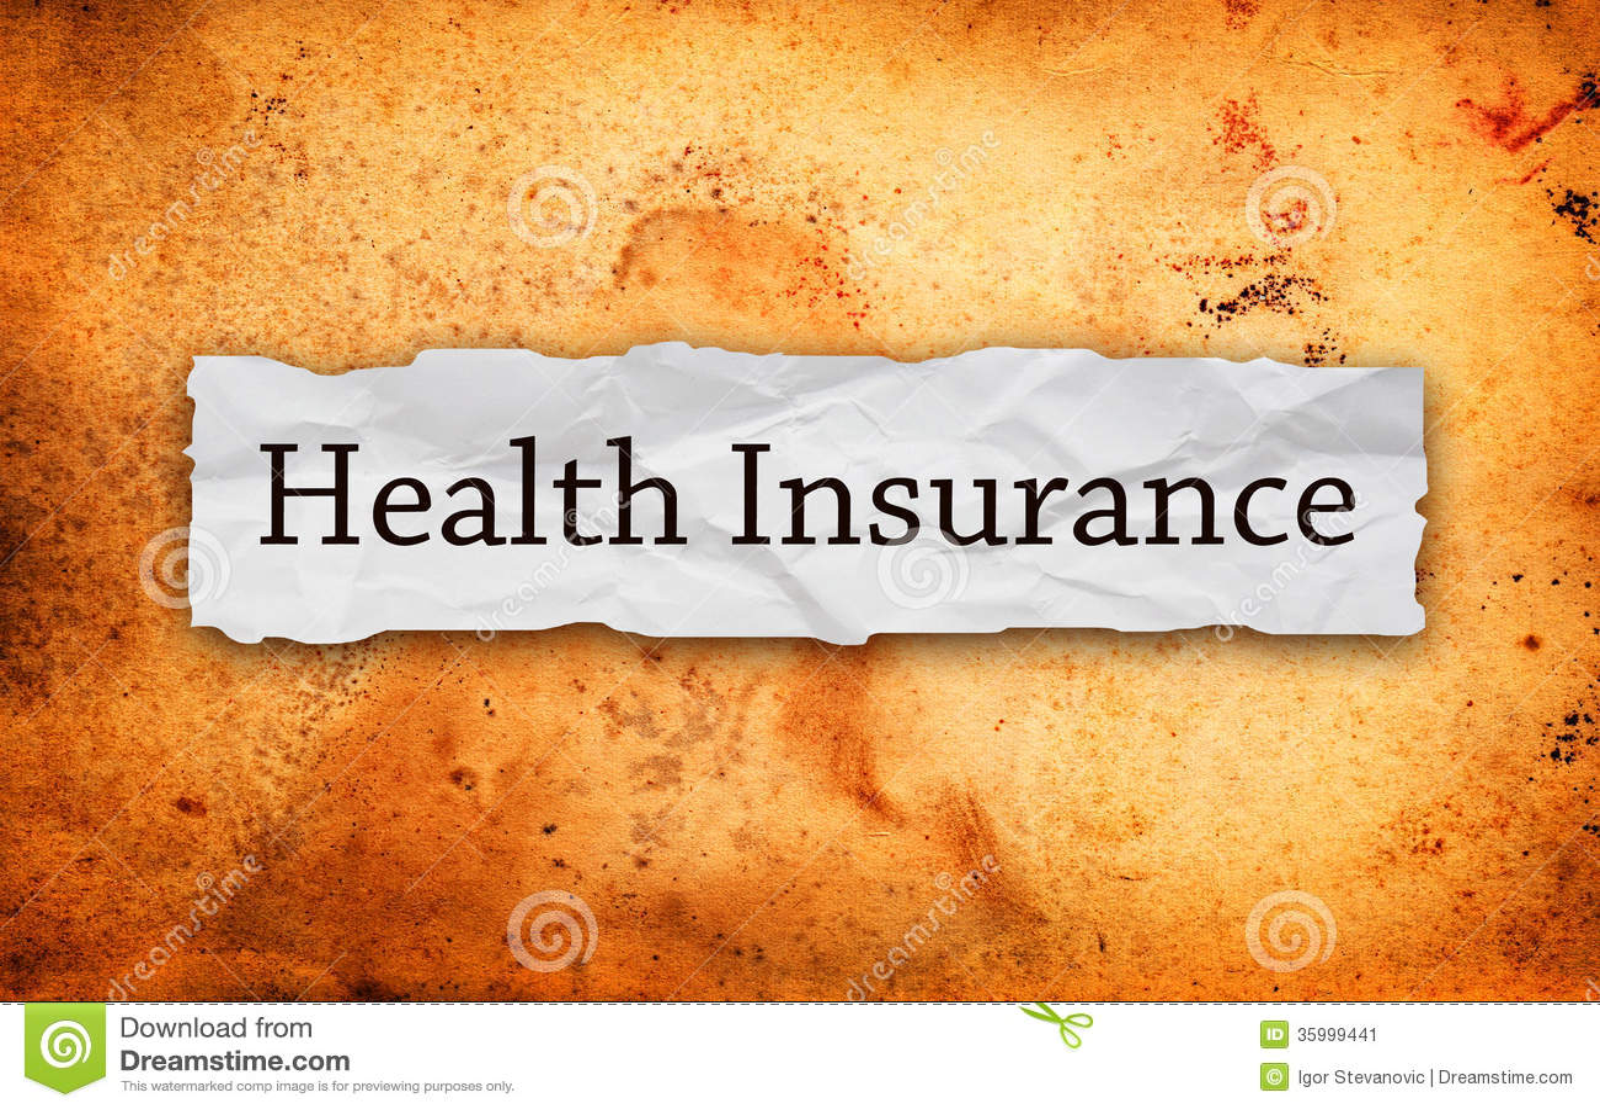 Health insurance essay